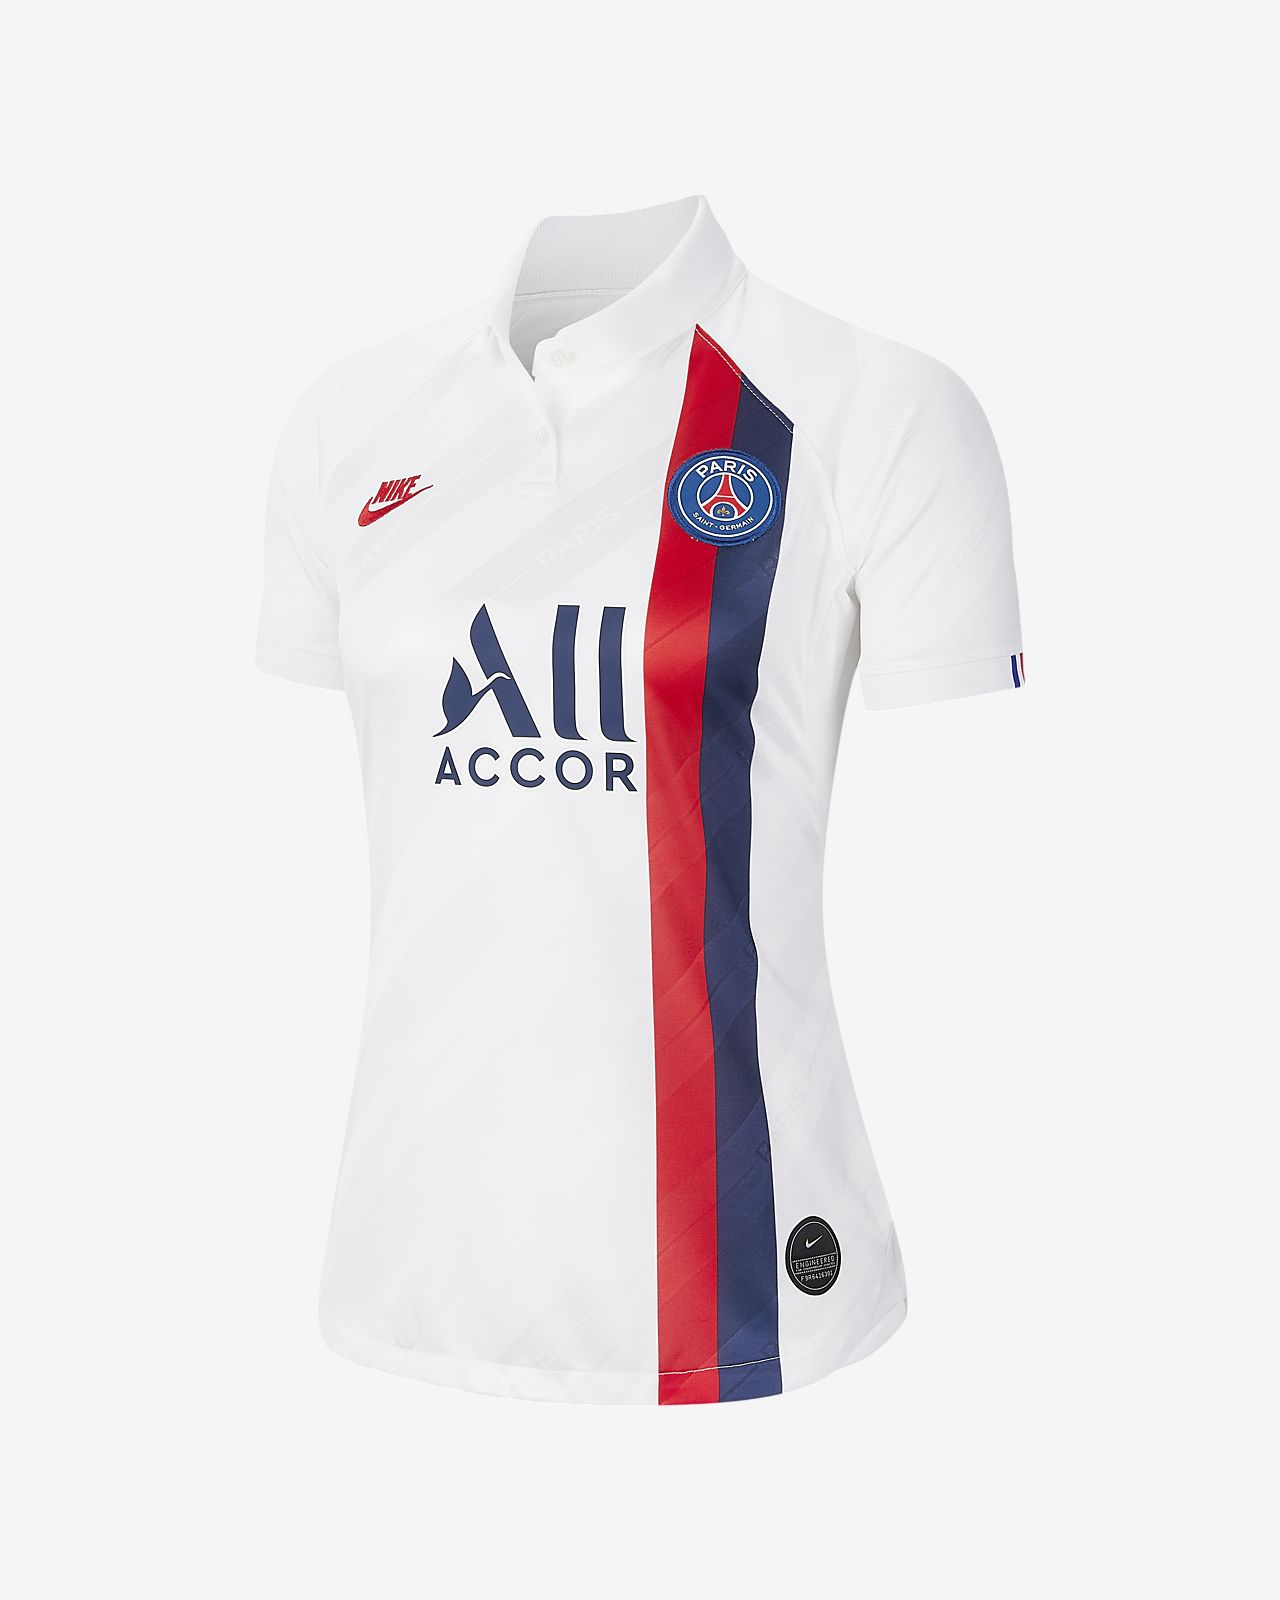 Maillot de football Paris Saint-Germain 2019/20 Stadium Third pour Femme